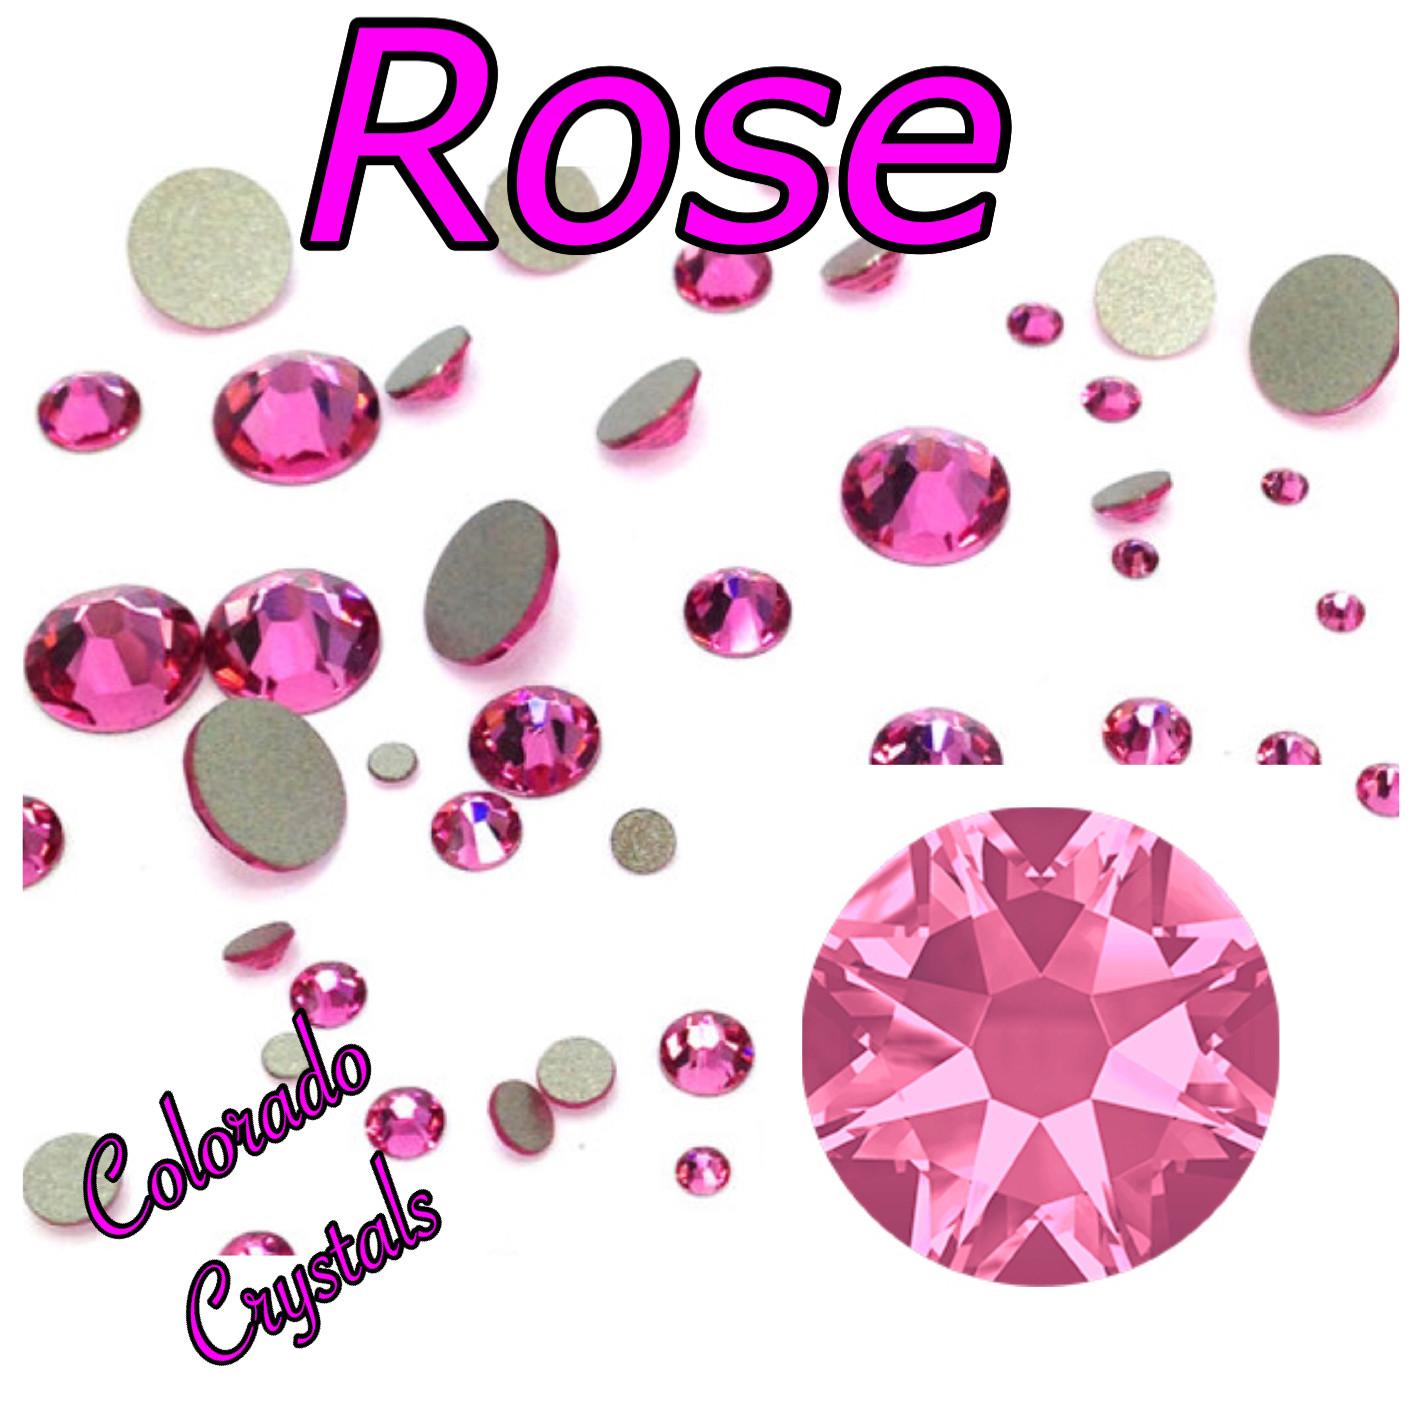 Rose 30ss 2088 Limited Swarovski Pink flat back